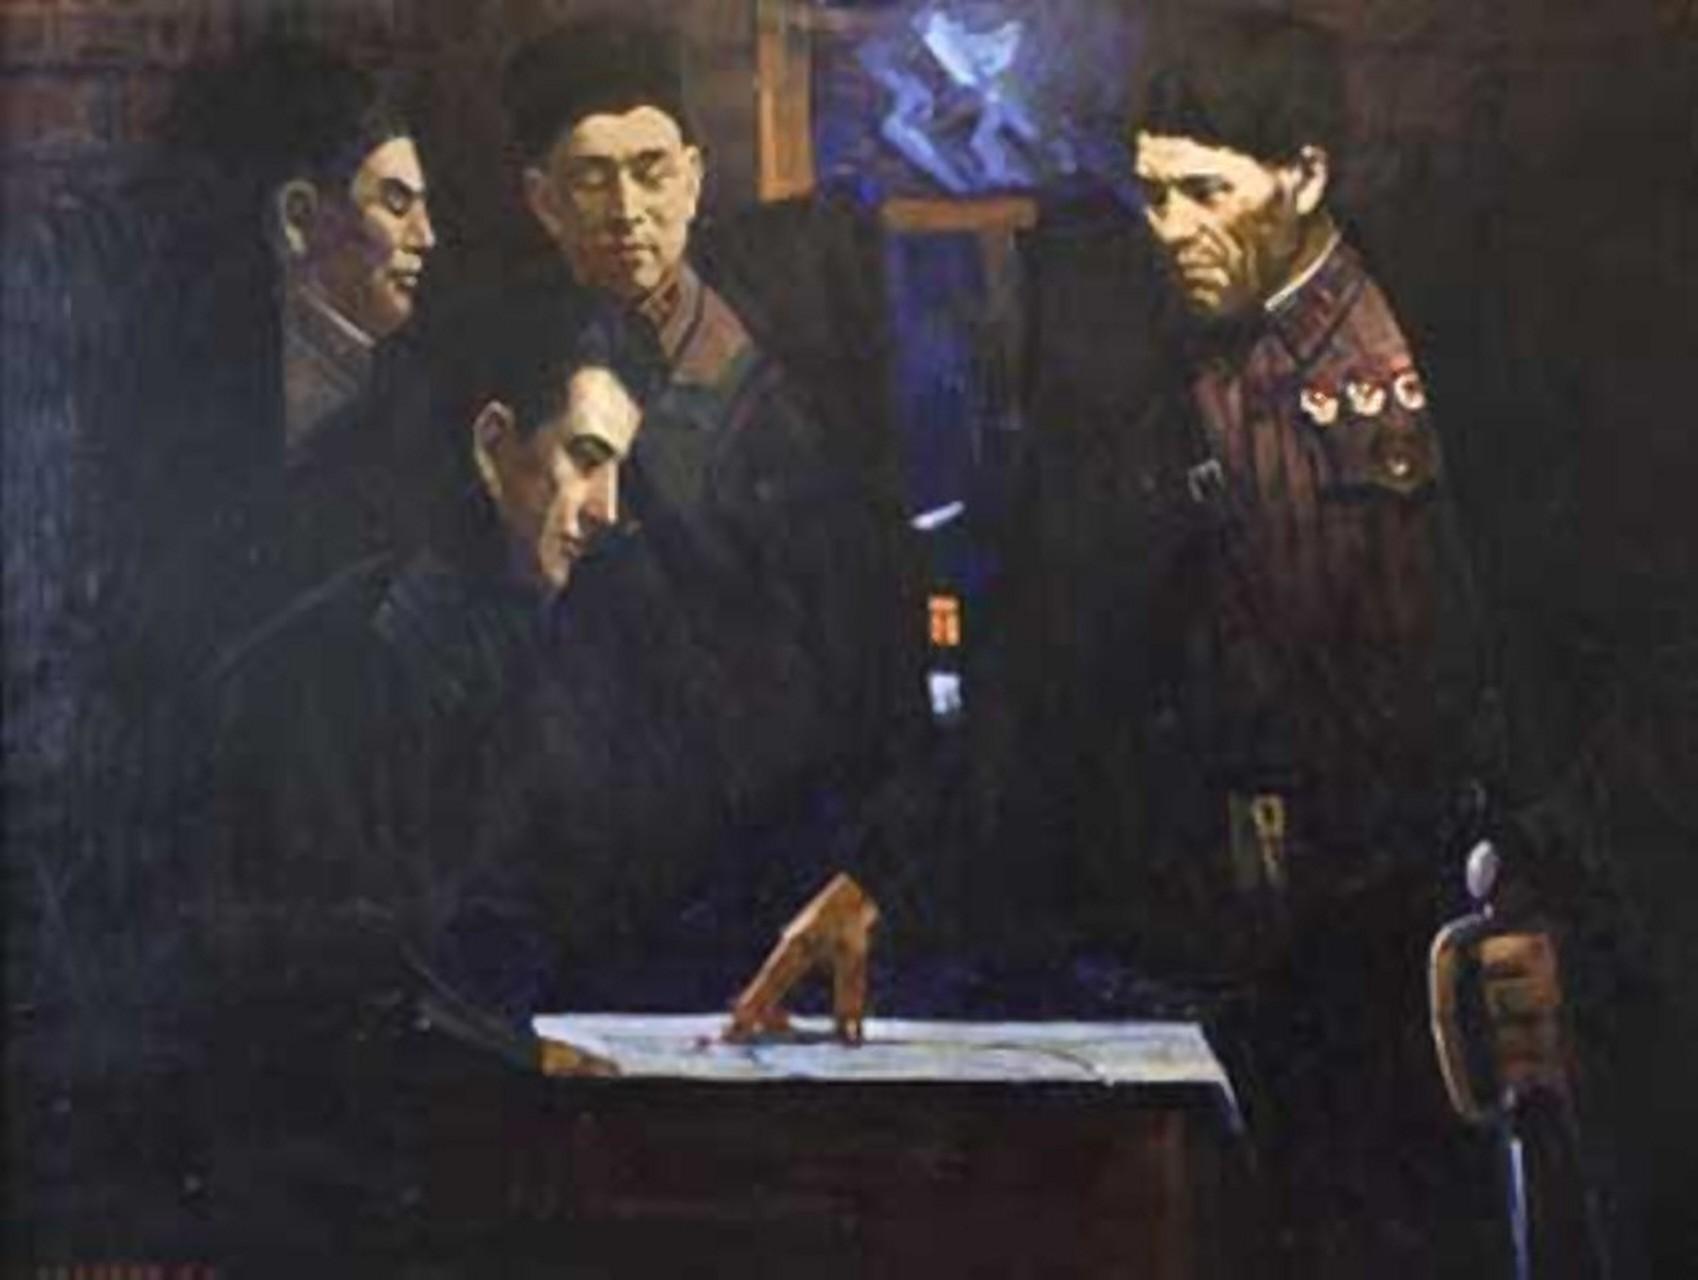 «В штабе дивизии М. Шаймуратова», Григорий Круглов